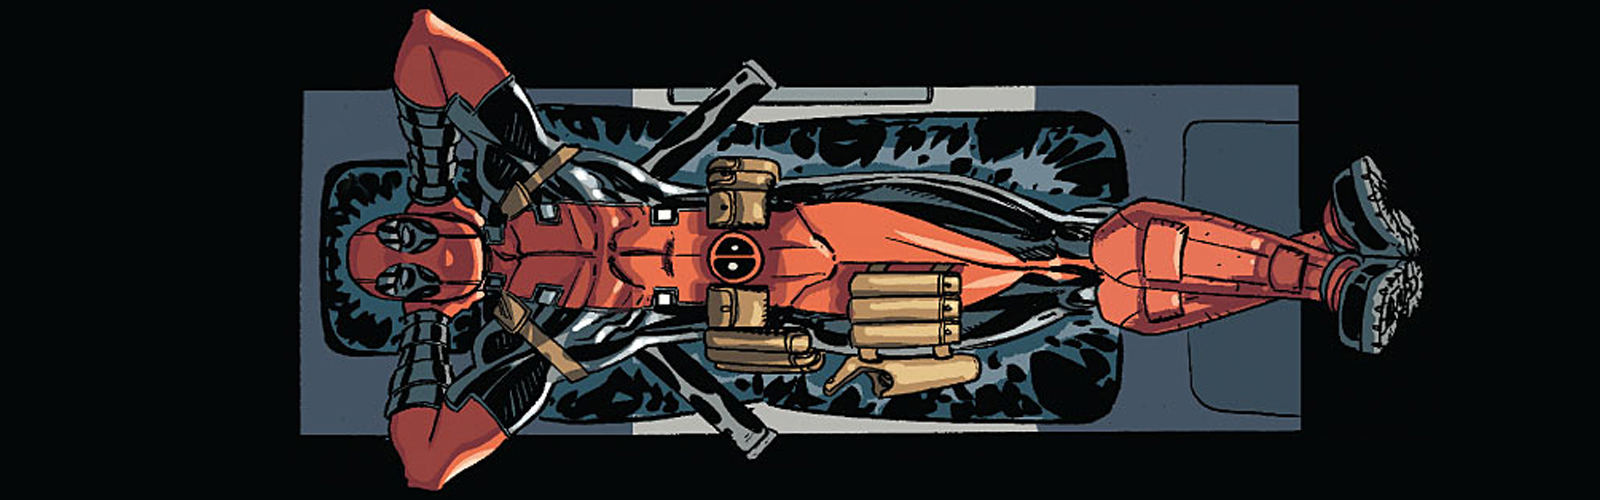 New Releases - 10-02-16: Deadpool